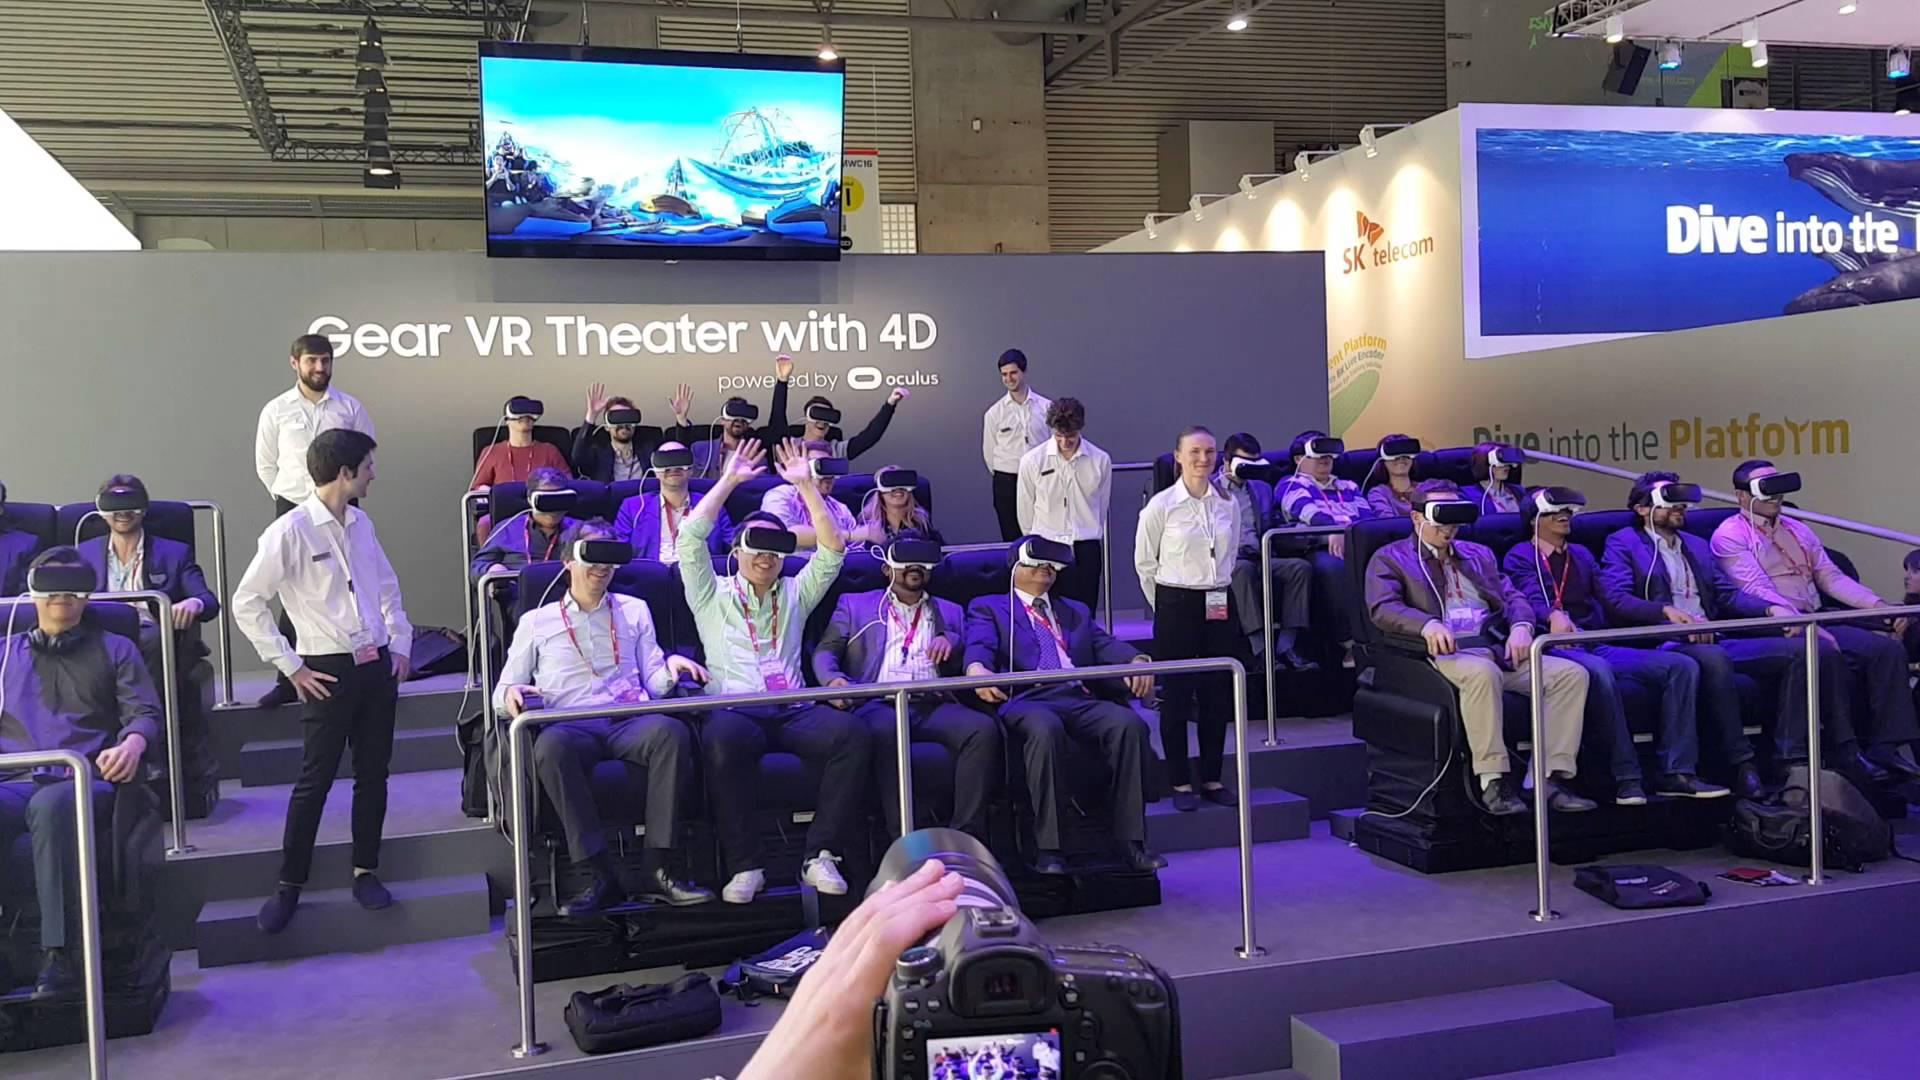 Samsung Gear VR 4D